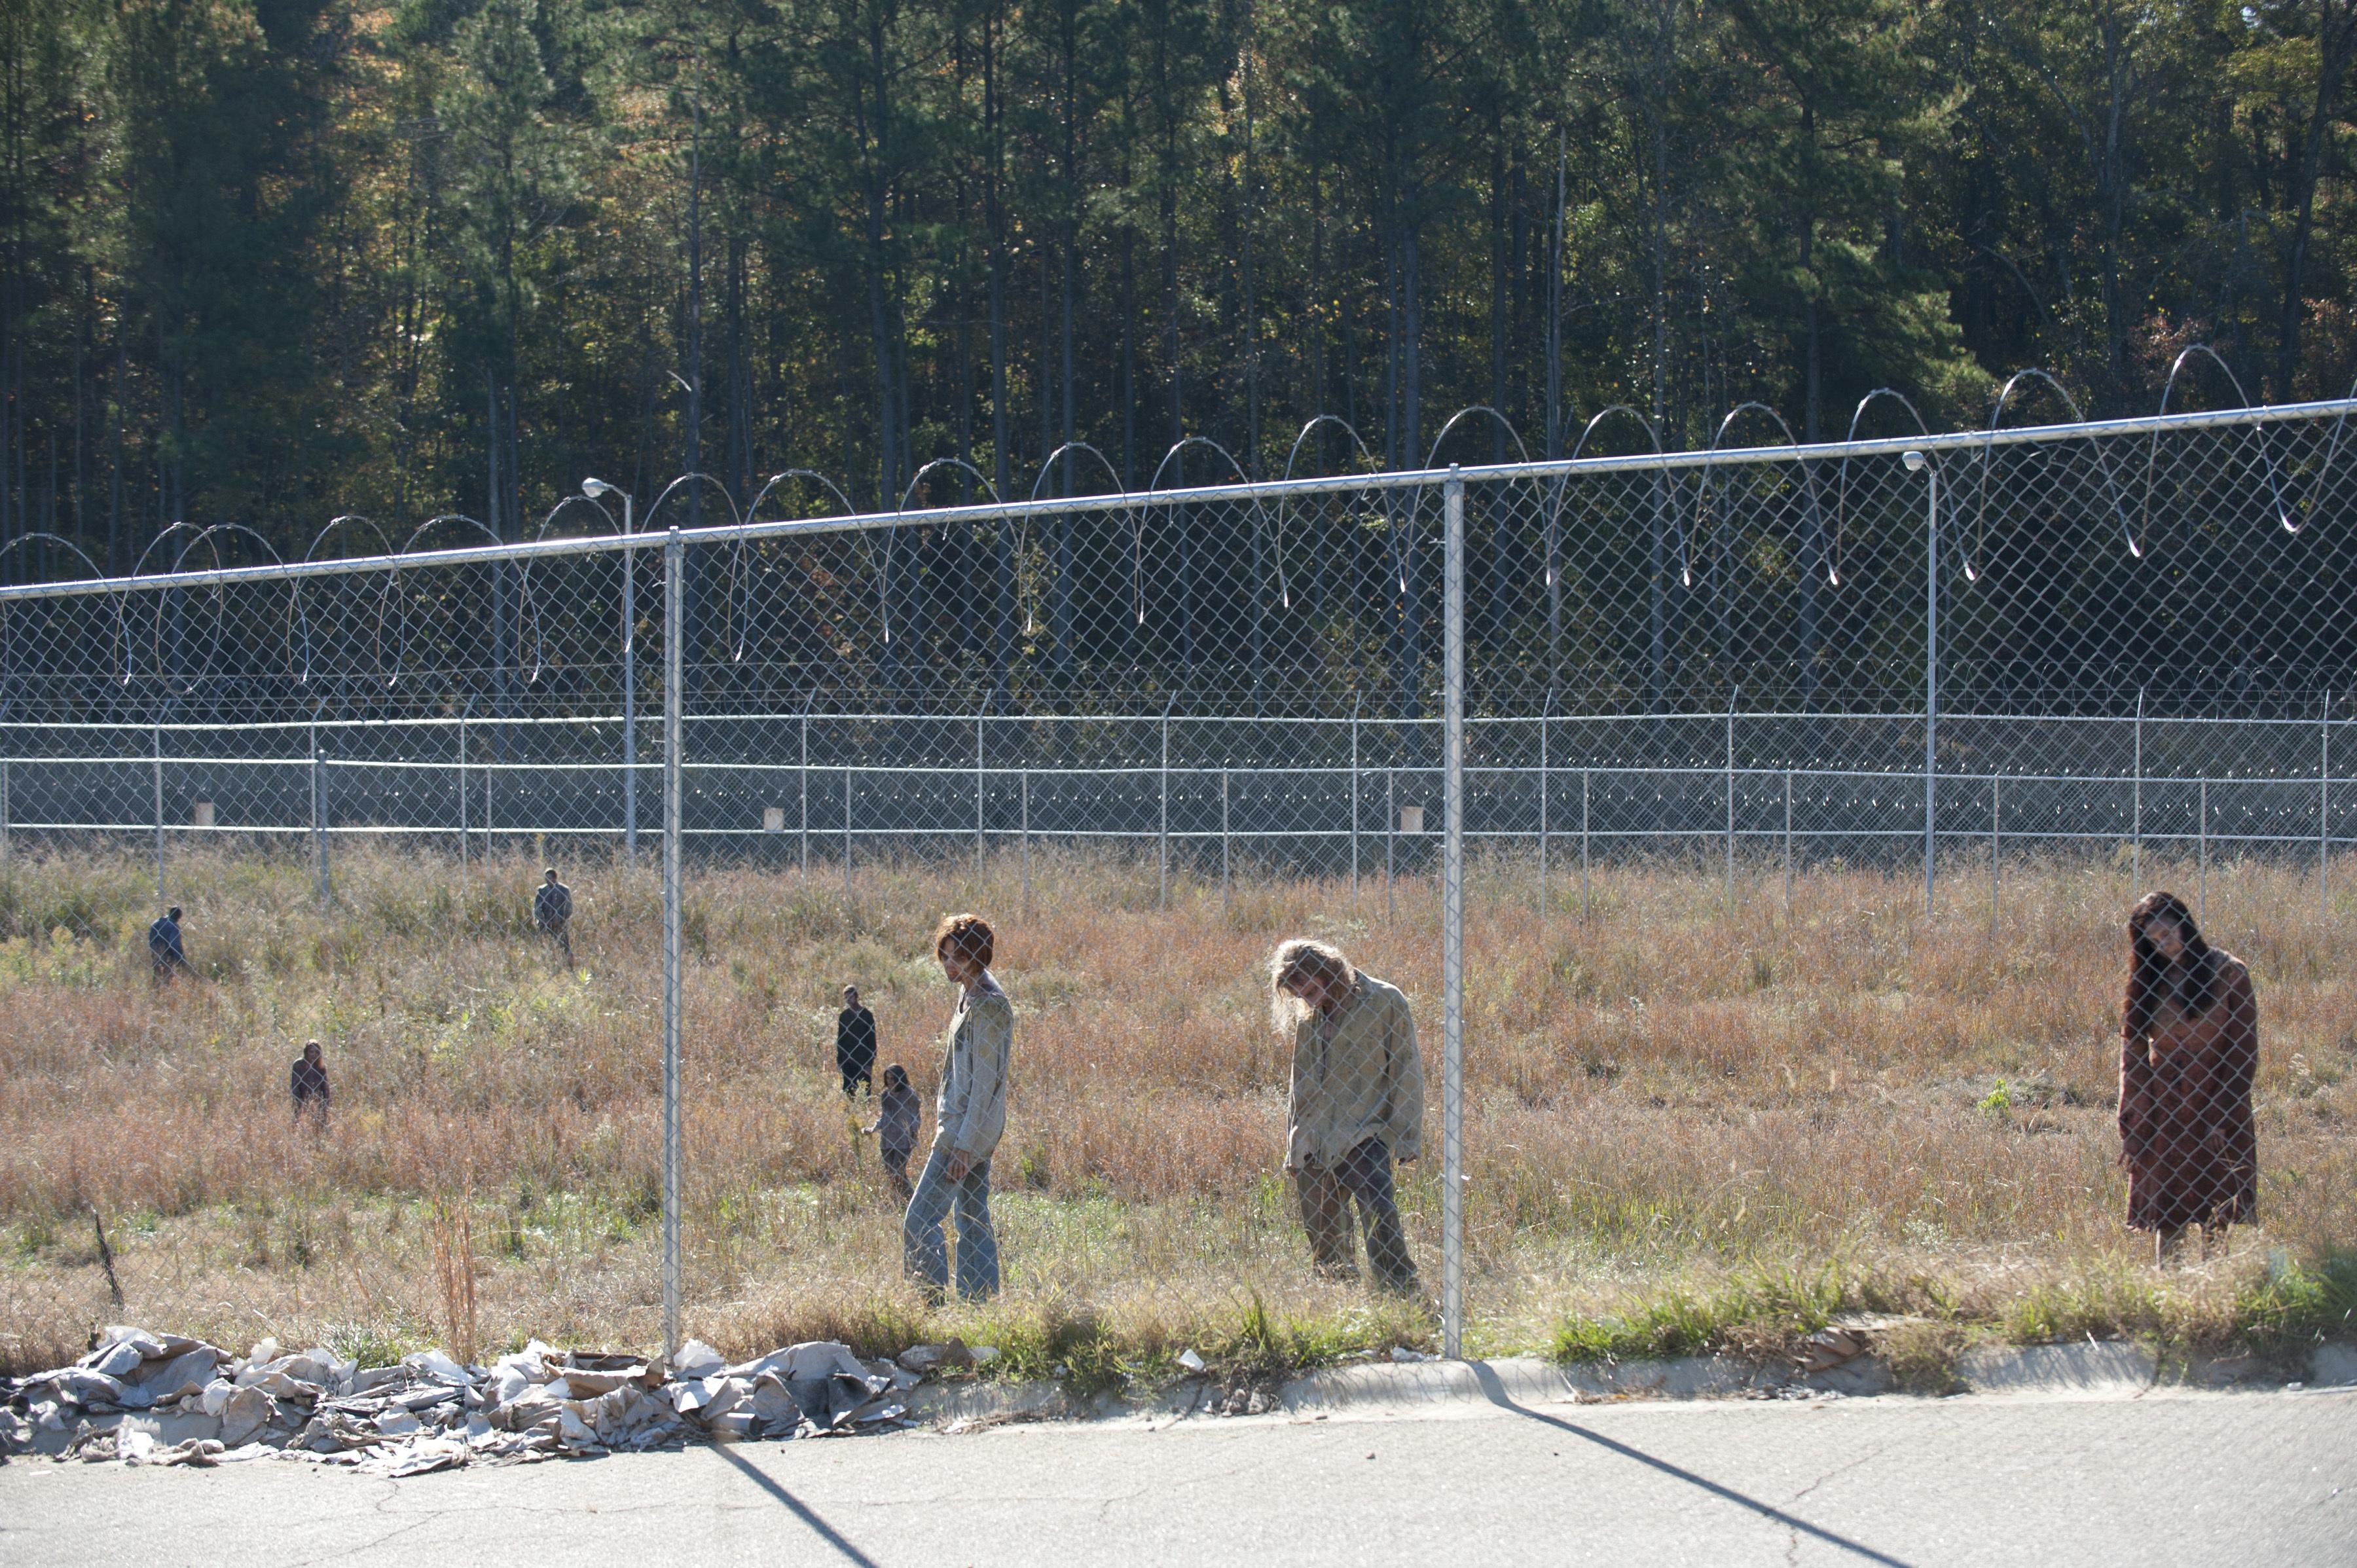 File:The-walking-dead-season-3-episode-15-this-sorrowful-life-5 FULL.jpg